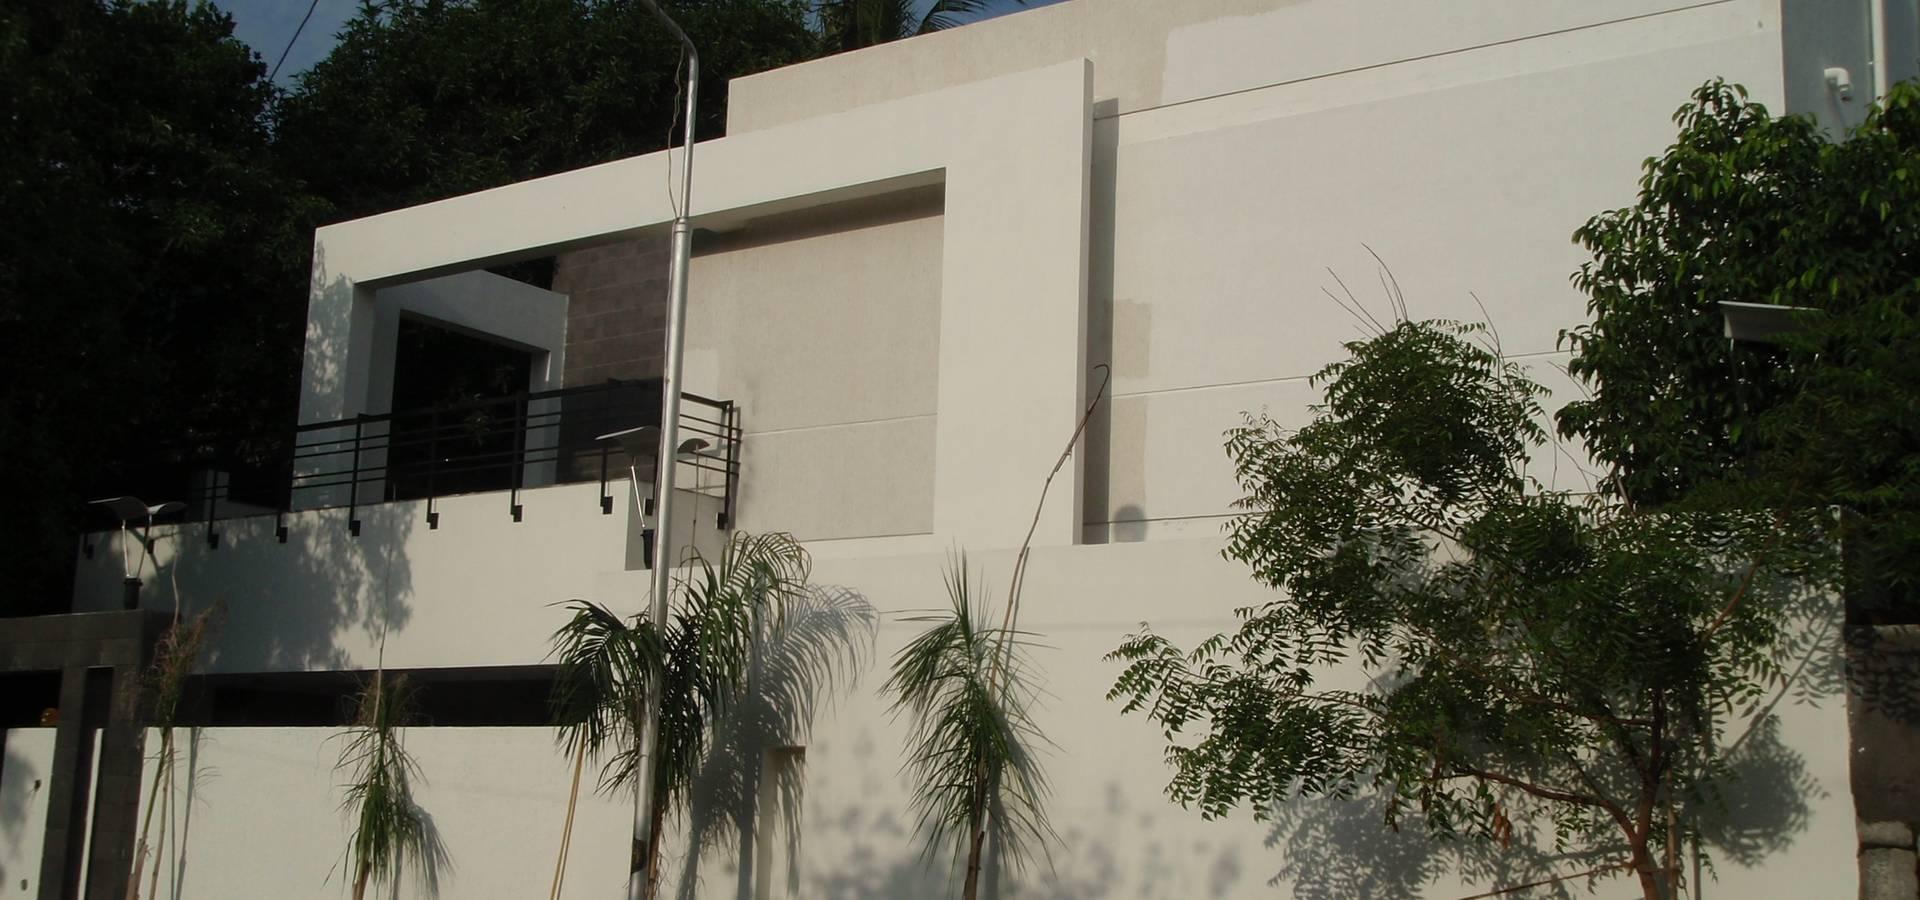 sahanas creations architects